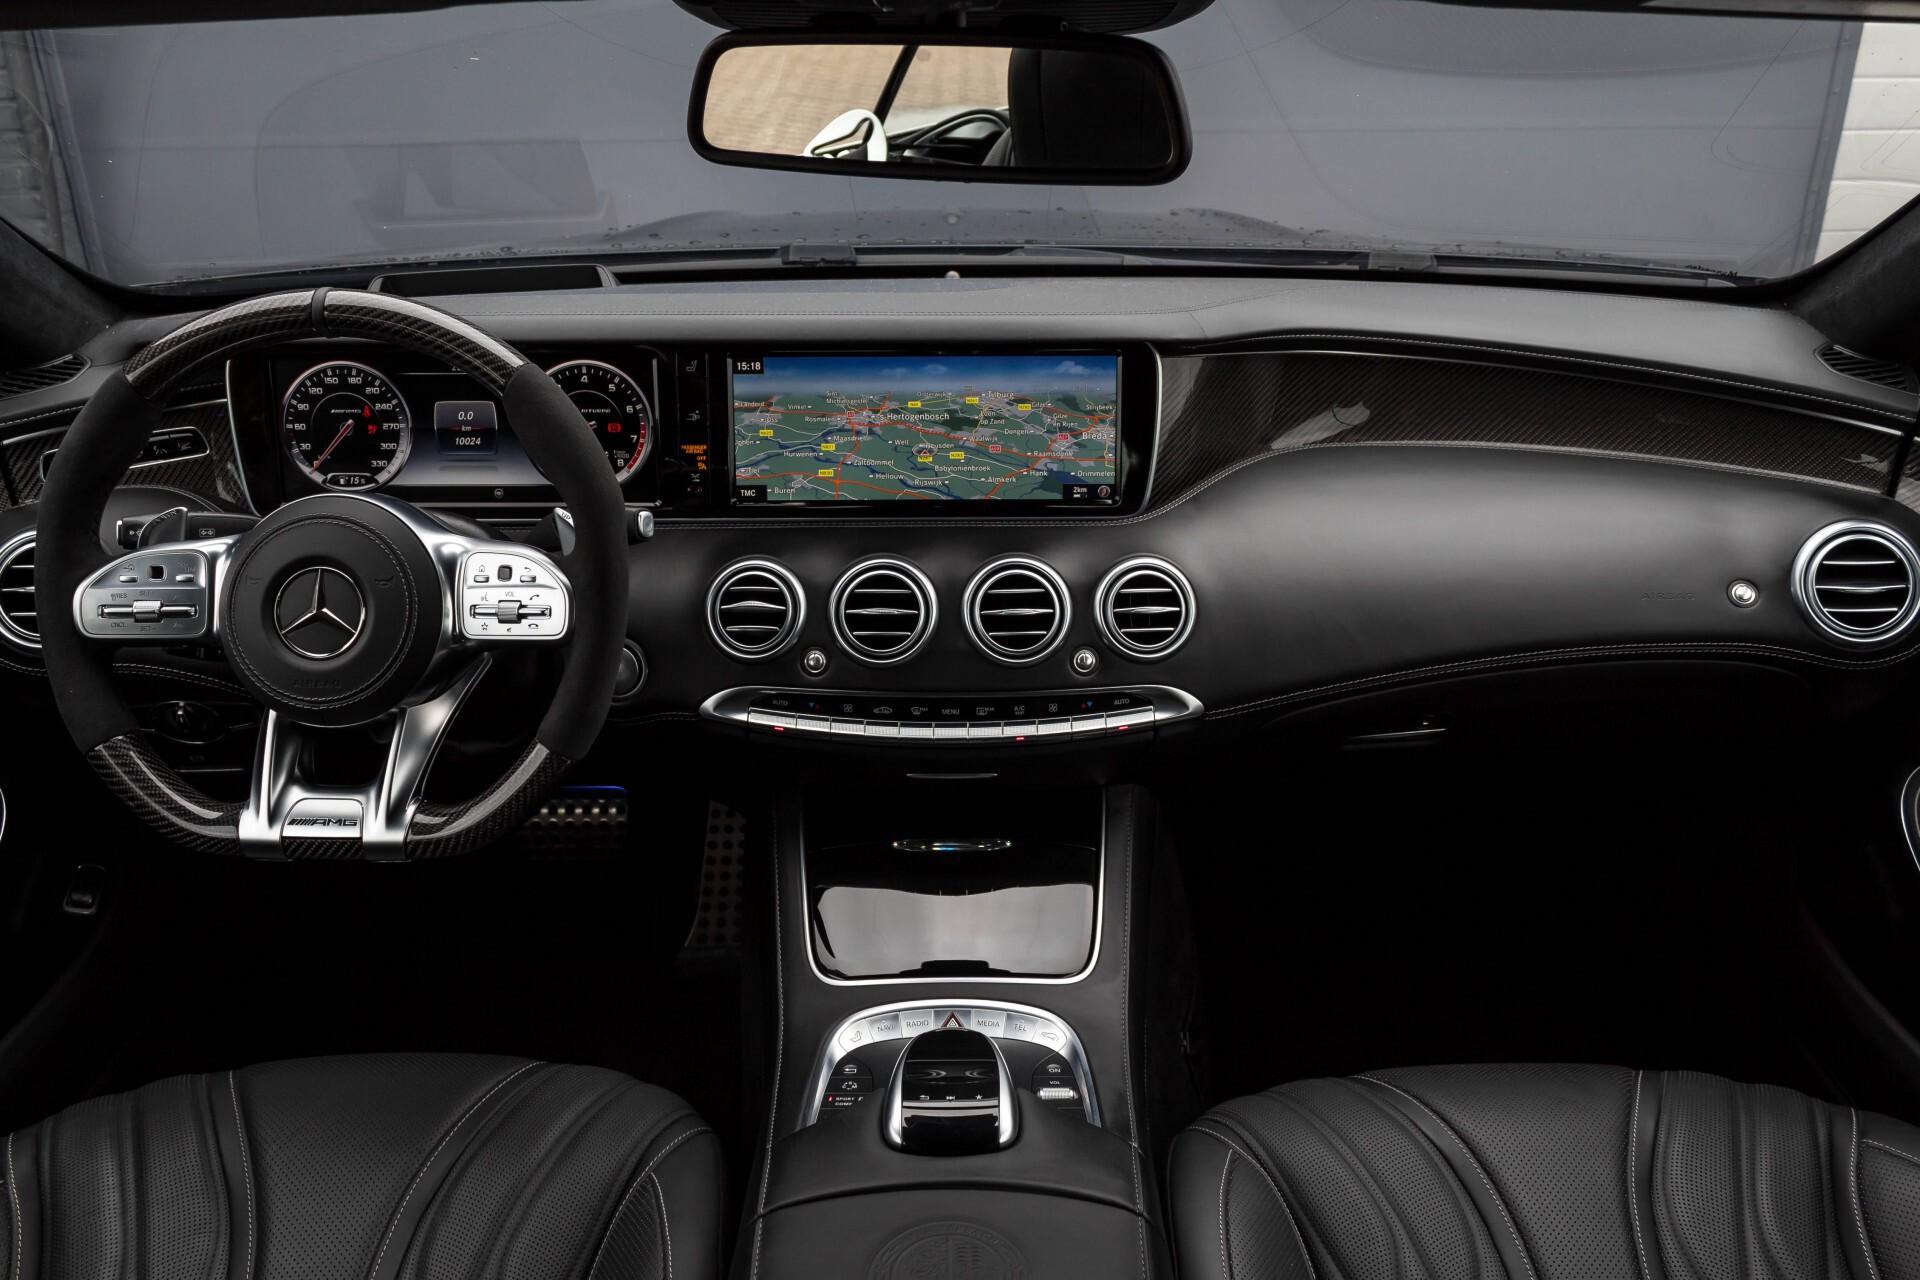 Mercedes-Benz S-Klasse Cabrio 63 AMG 4-M Ceramic/Designo/Carbon/Burmester High End Aut Foto 9